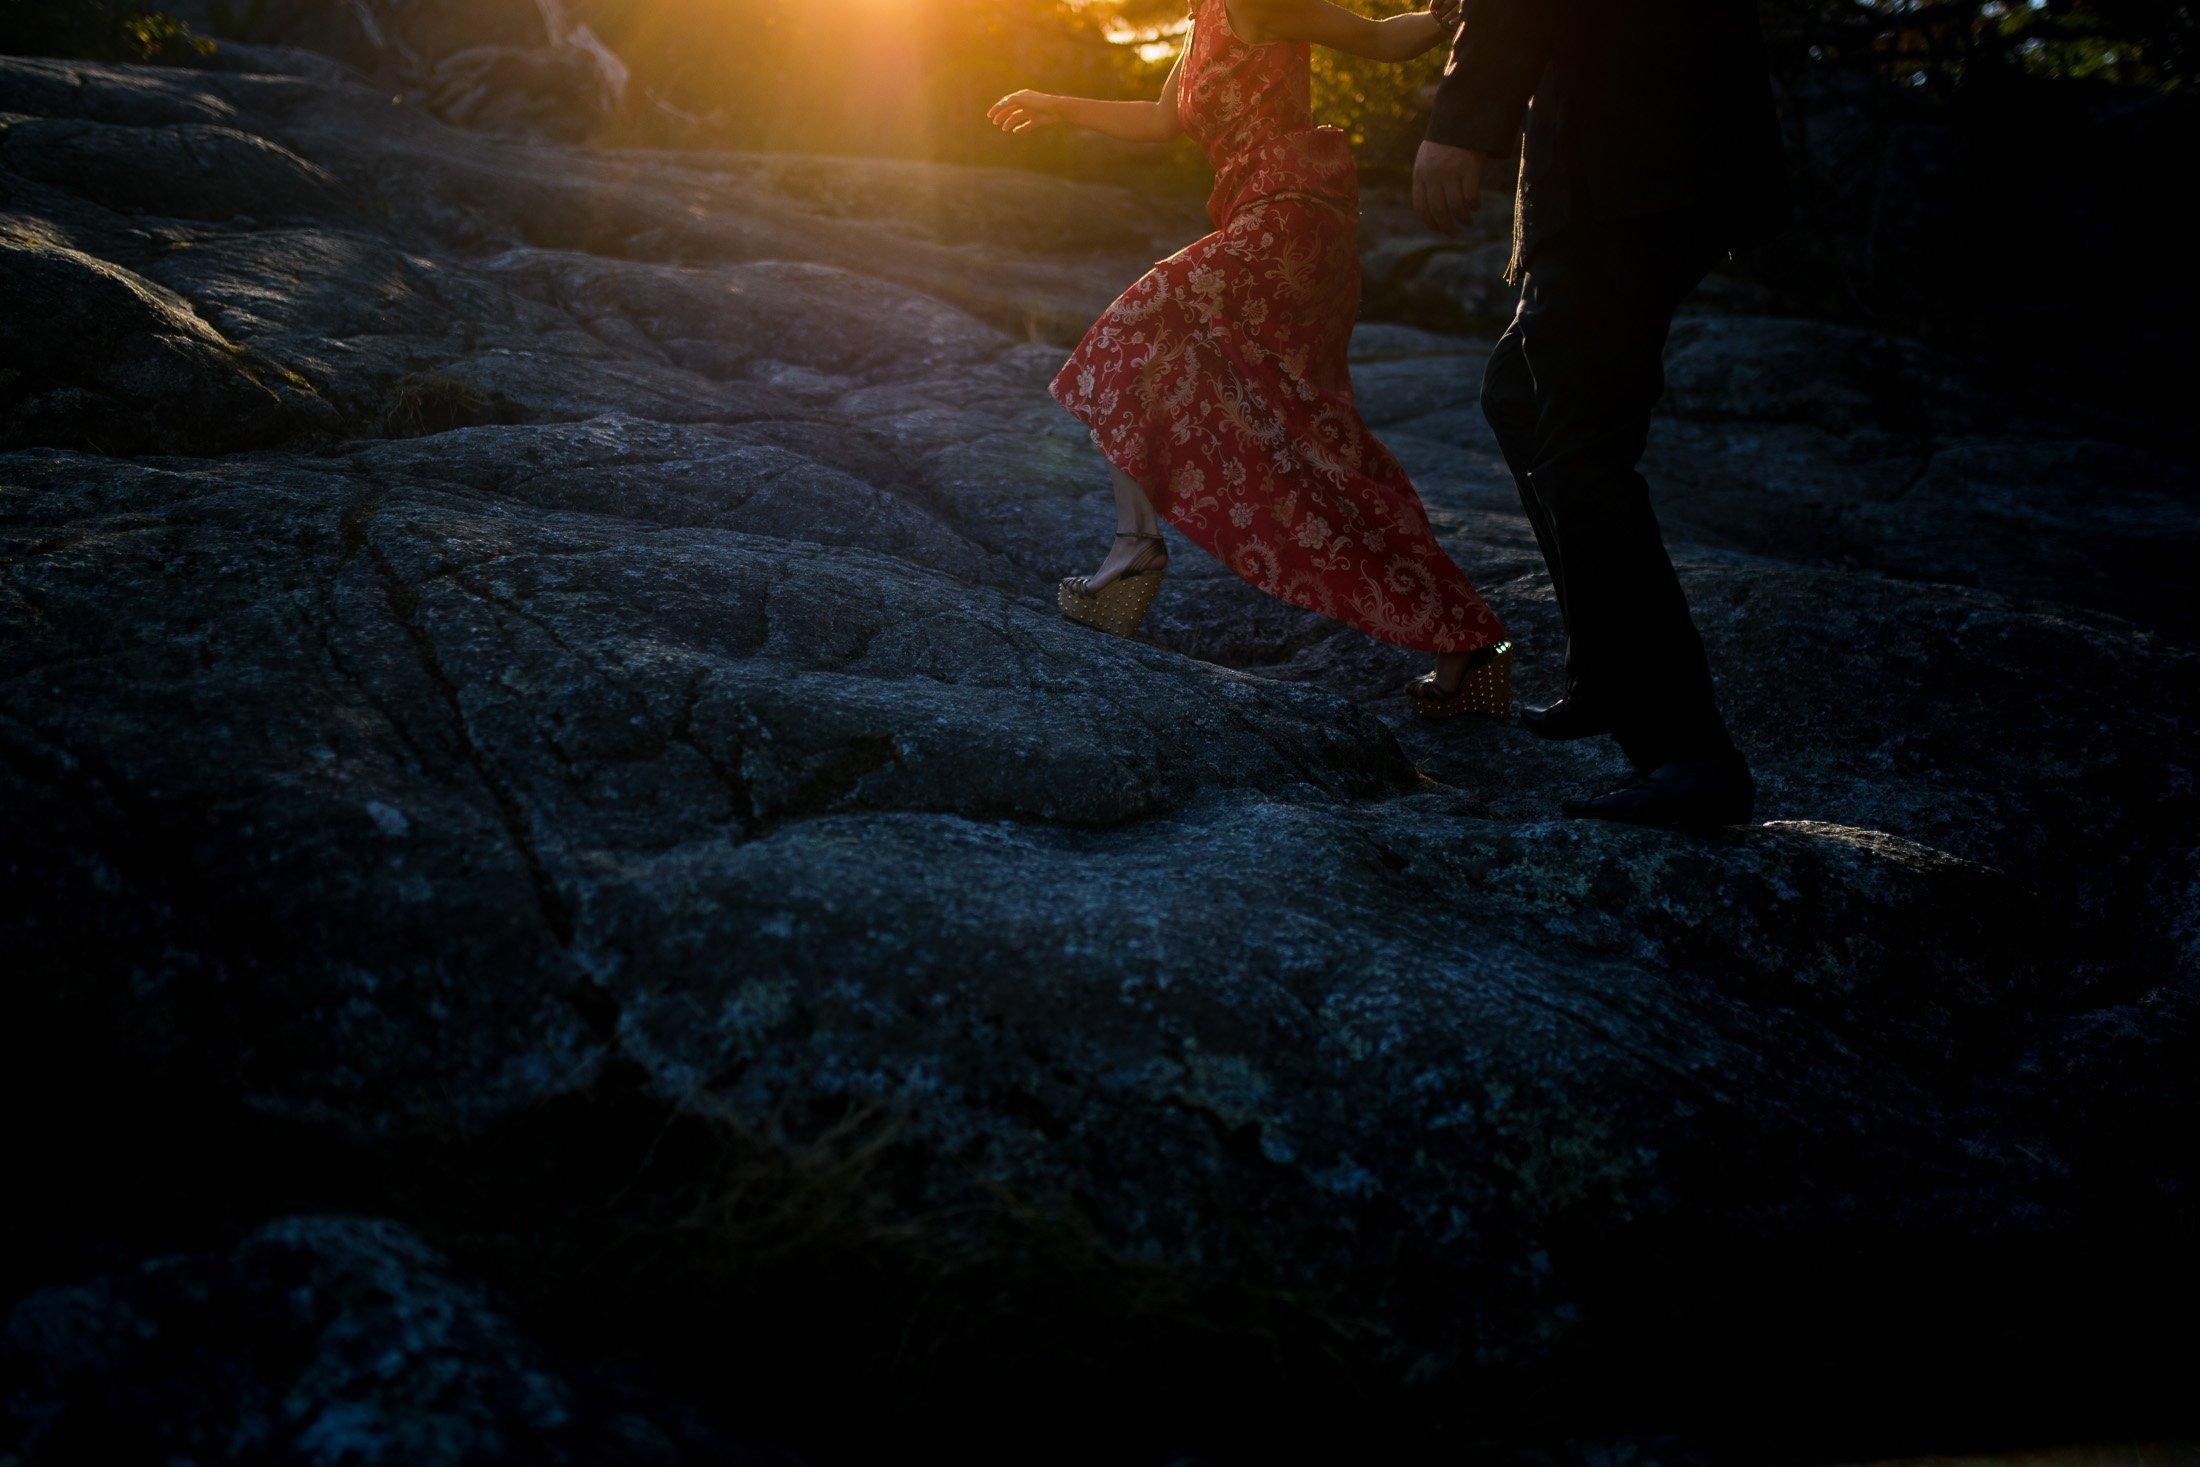 023 - candid wedding photos vancouver